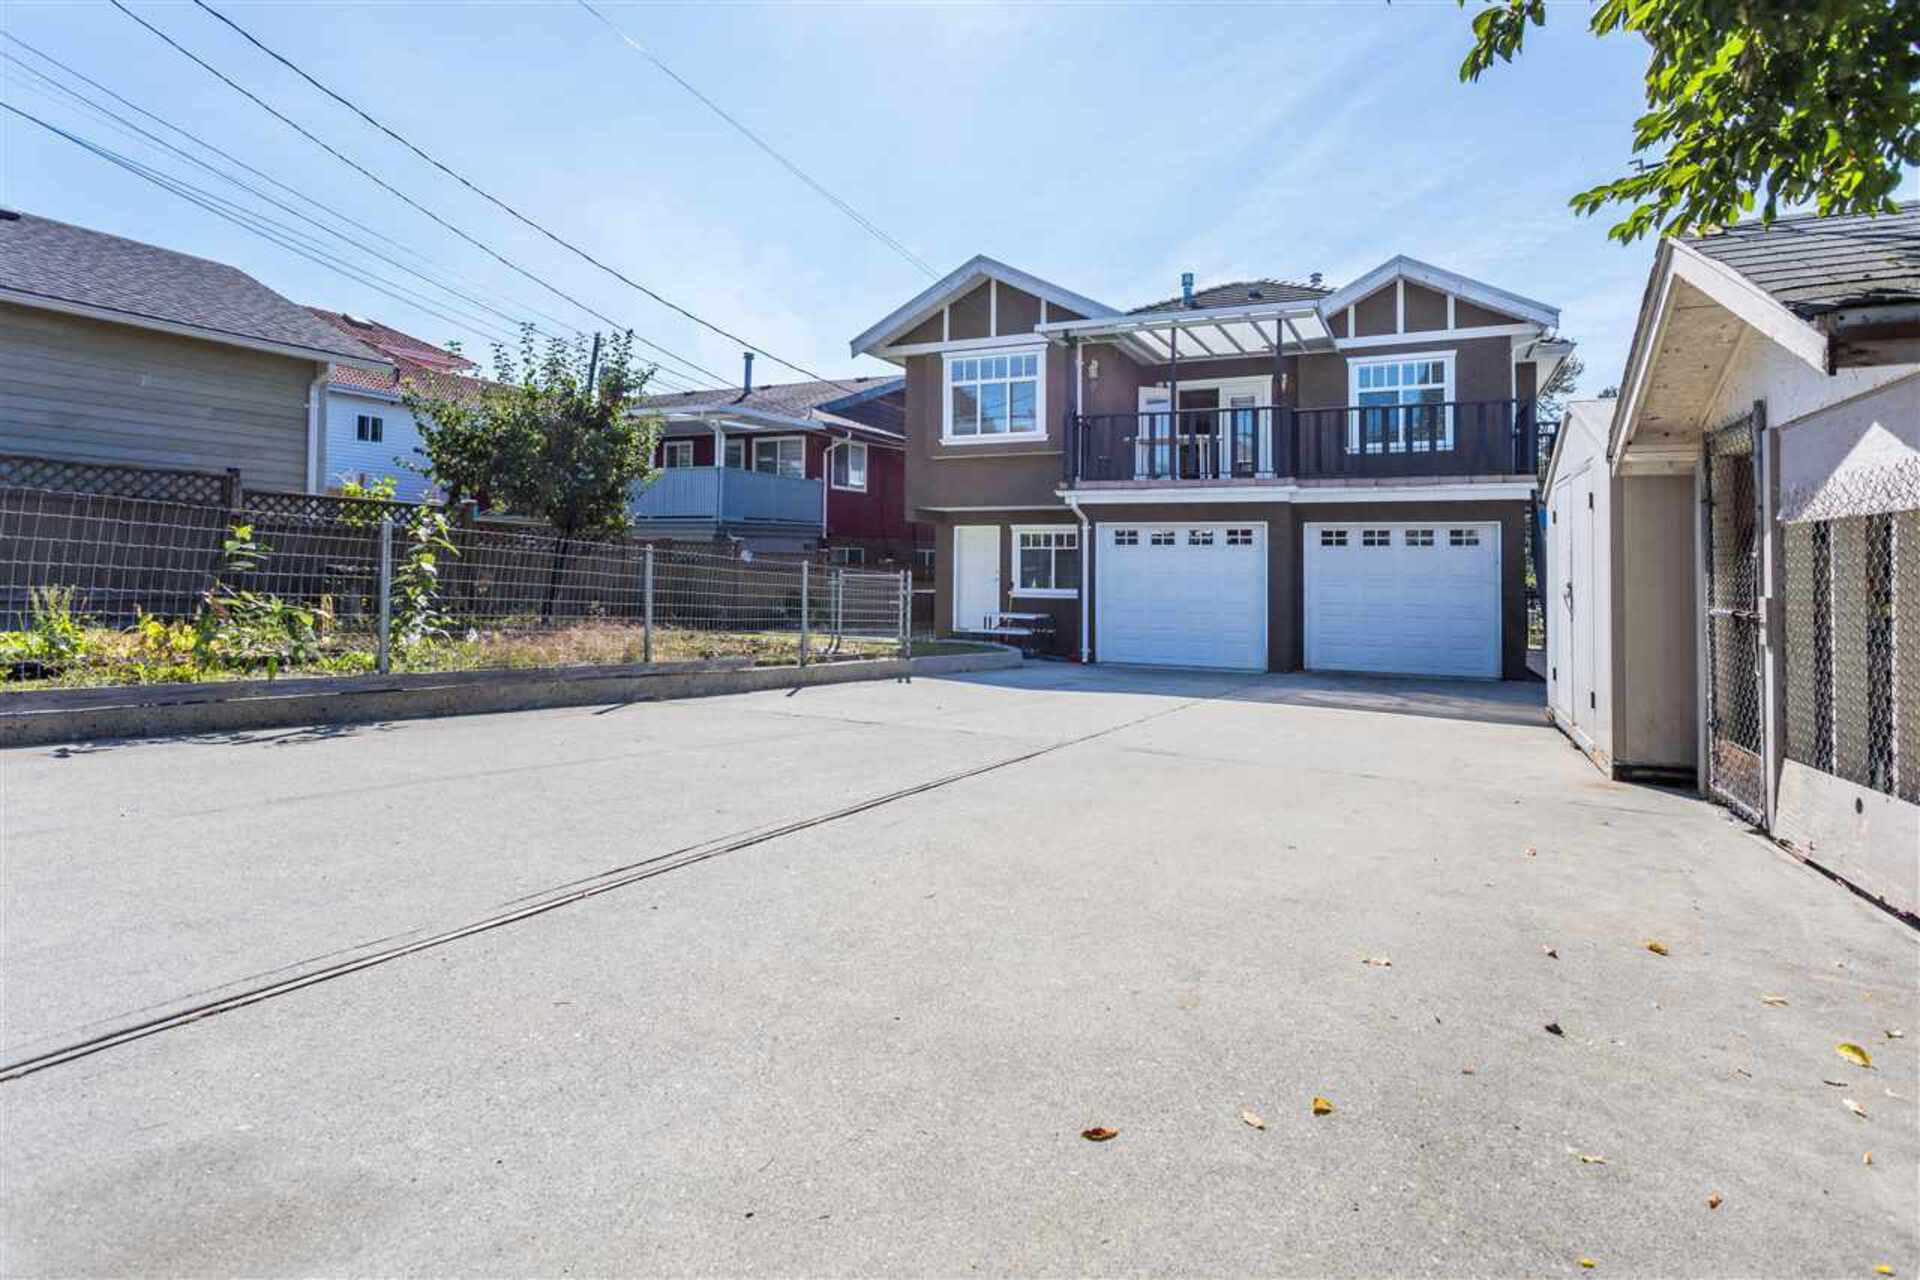 4015-frances-street-willingdon-heights-burnaby-north-20 at 4015 Frances Street, Willingdon Heights, Burnaby North